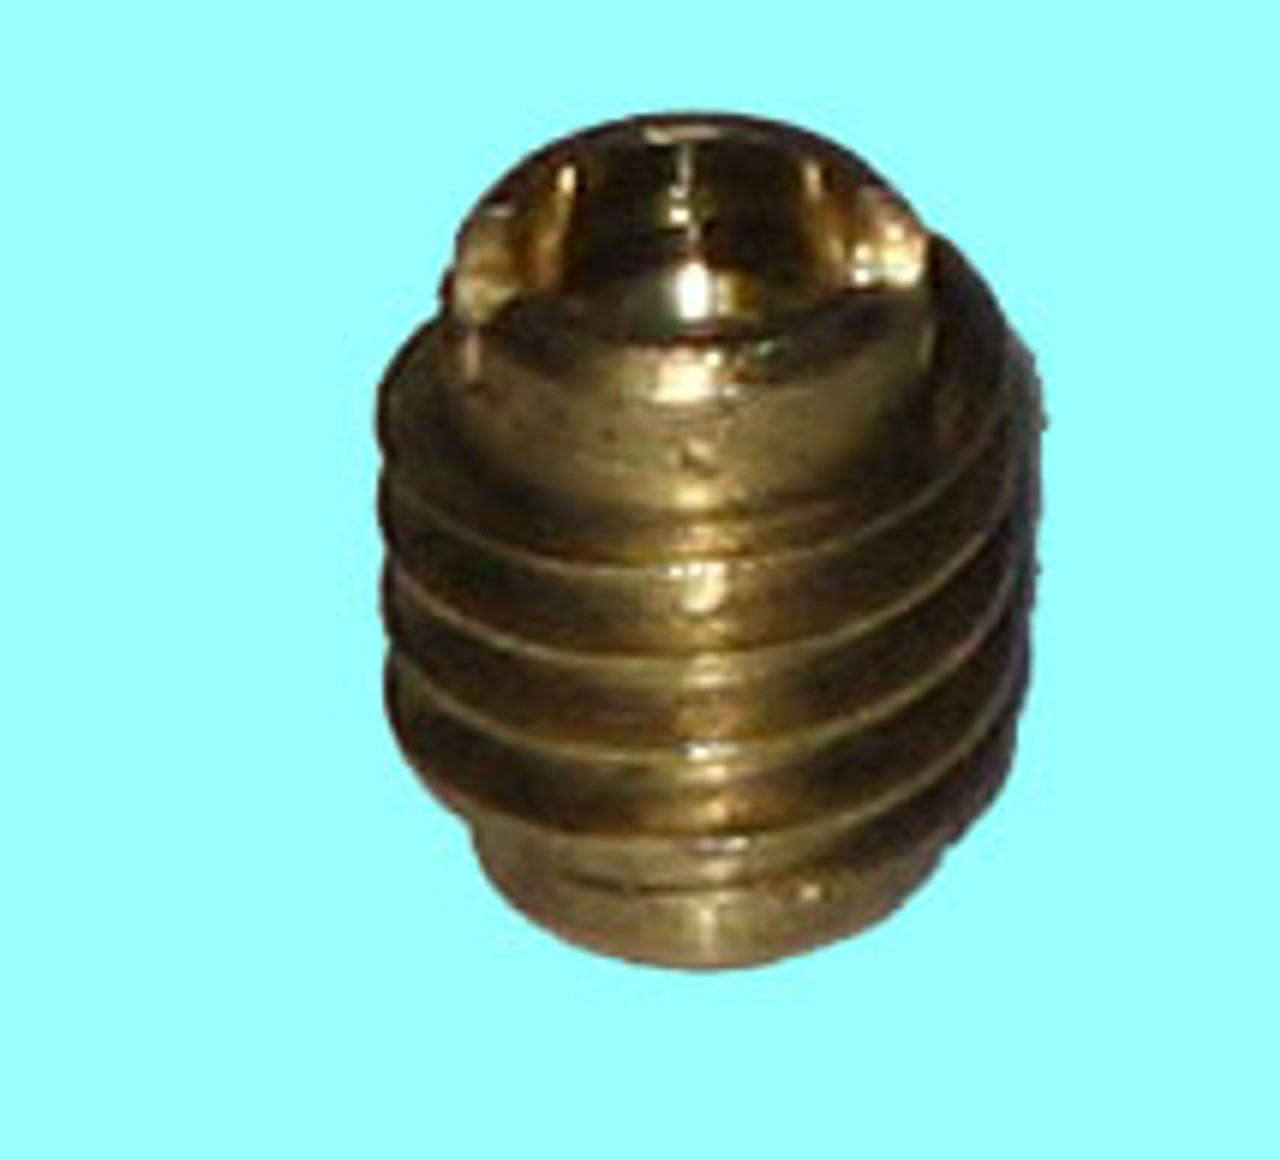 4-40 Brass Threaded Insert